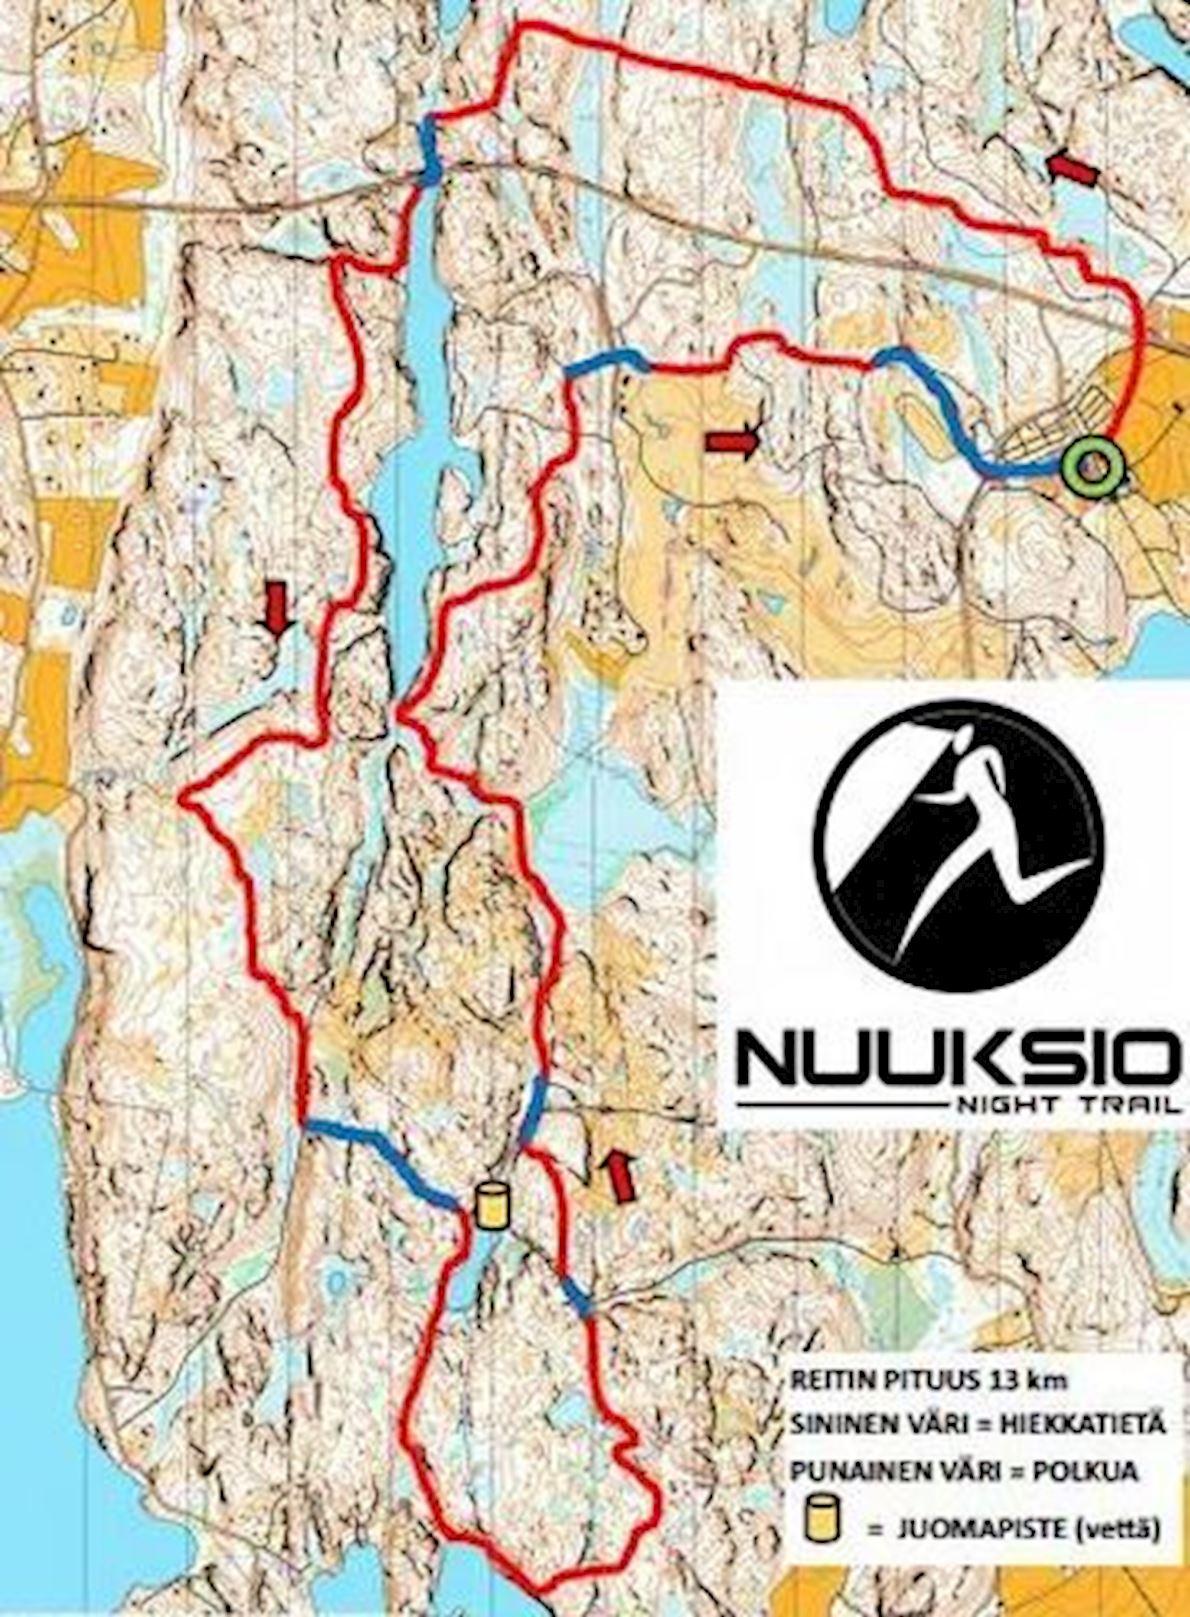 Nuuksio Night Trail ITINERAIRE